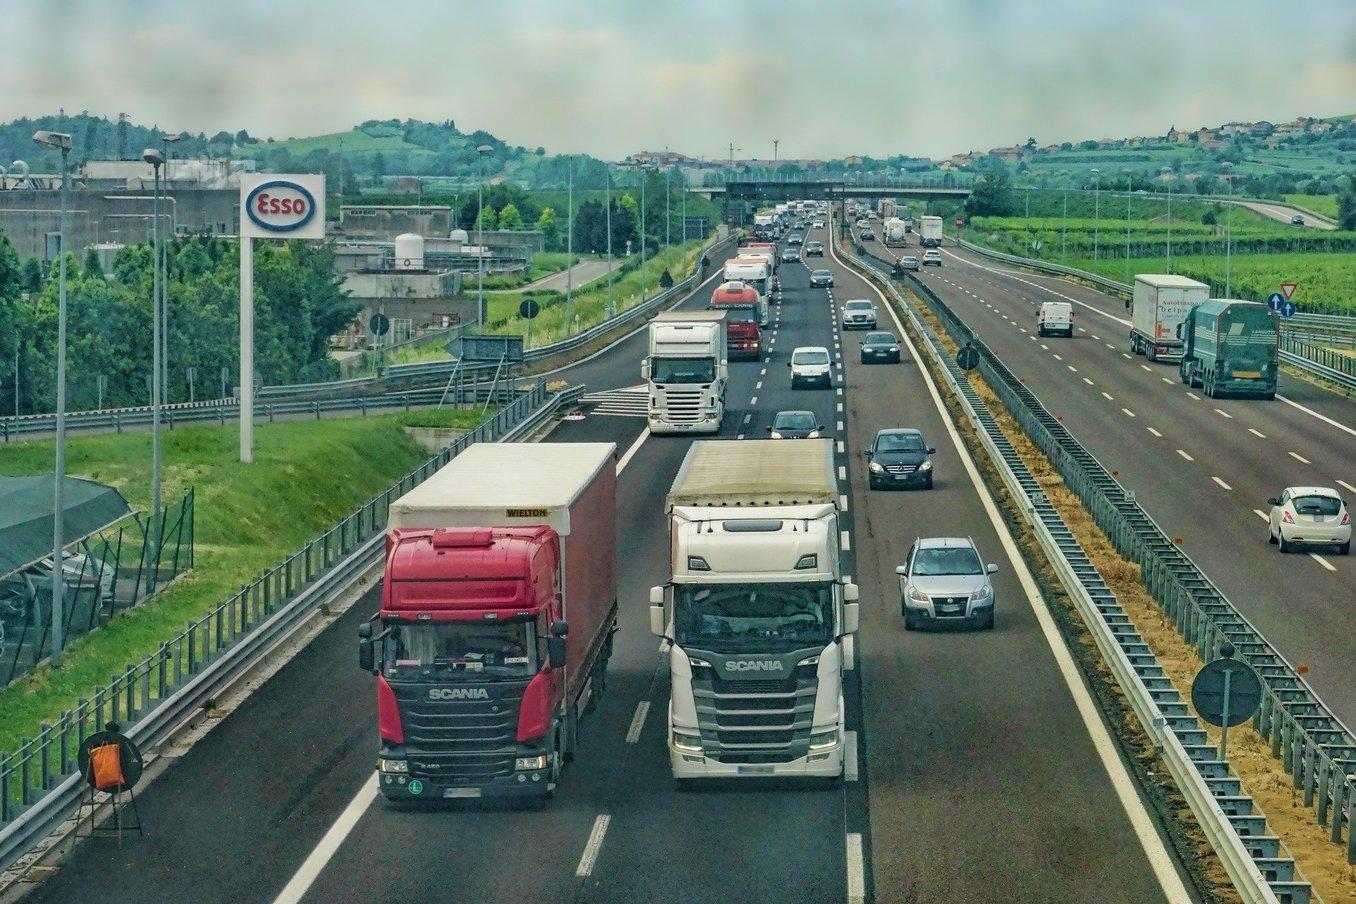 La CNMC sanciona dos cárteles formados por empresas de transporte de viajeros en Cantabria